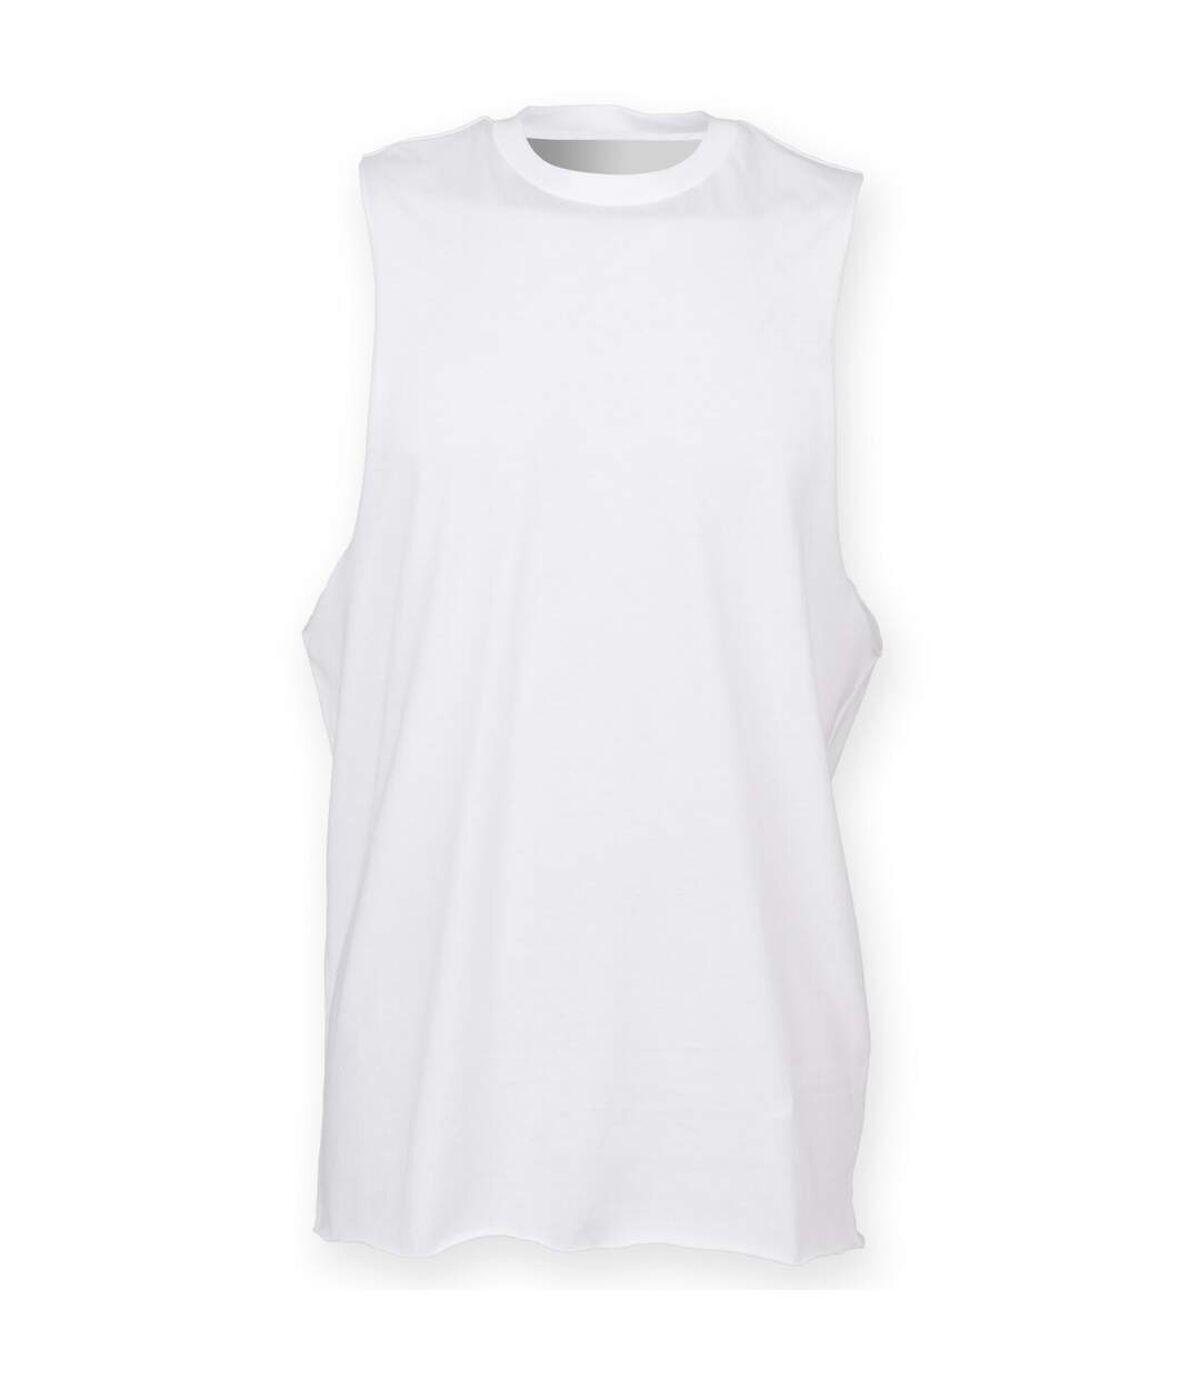 Skinnifit Mens High Neck Slash Armhole Vest (White) - UTRW4739